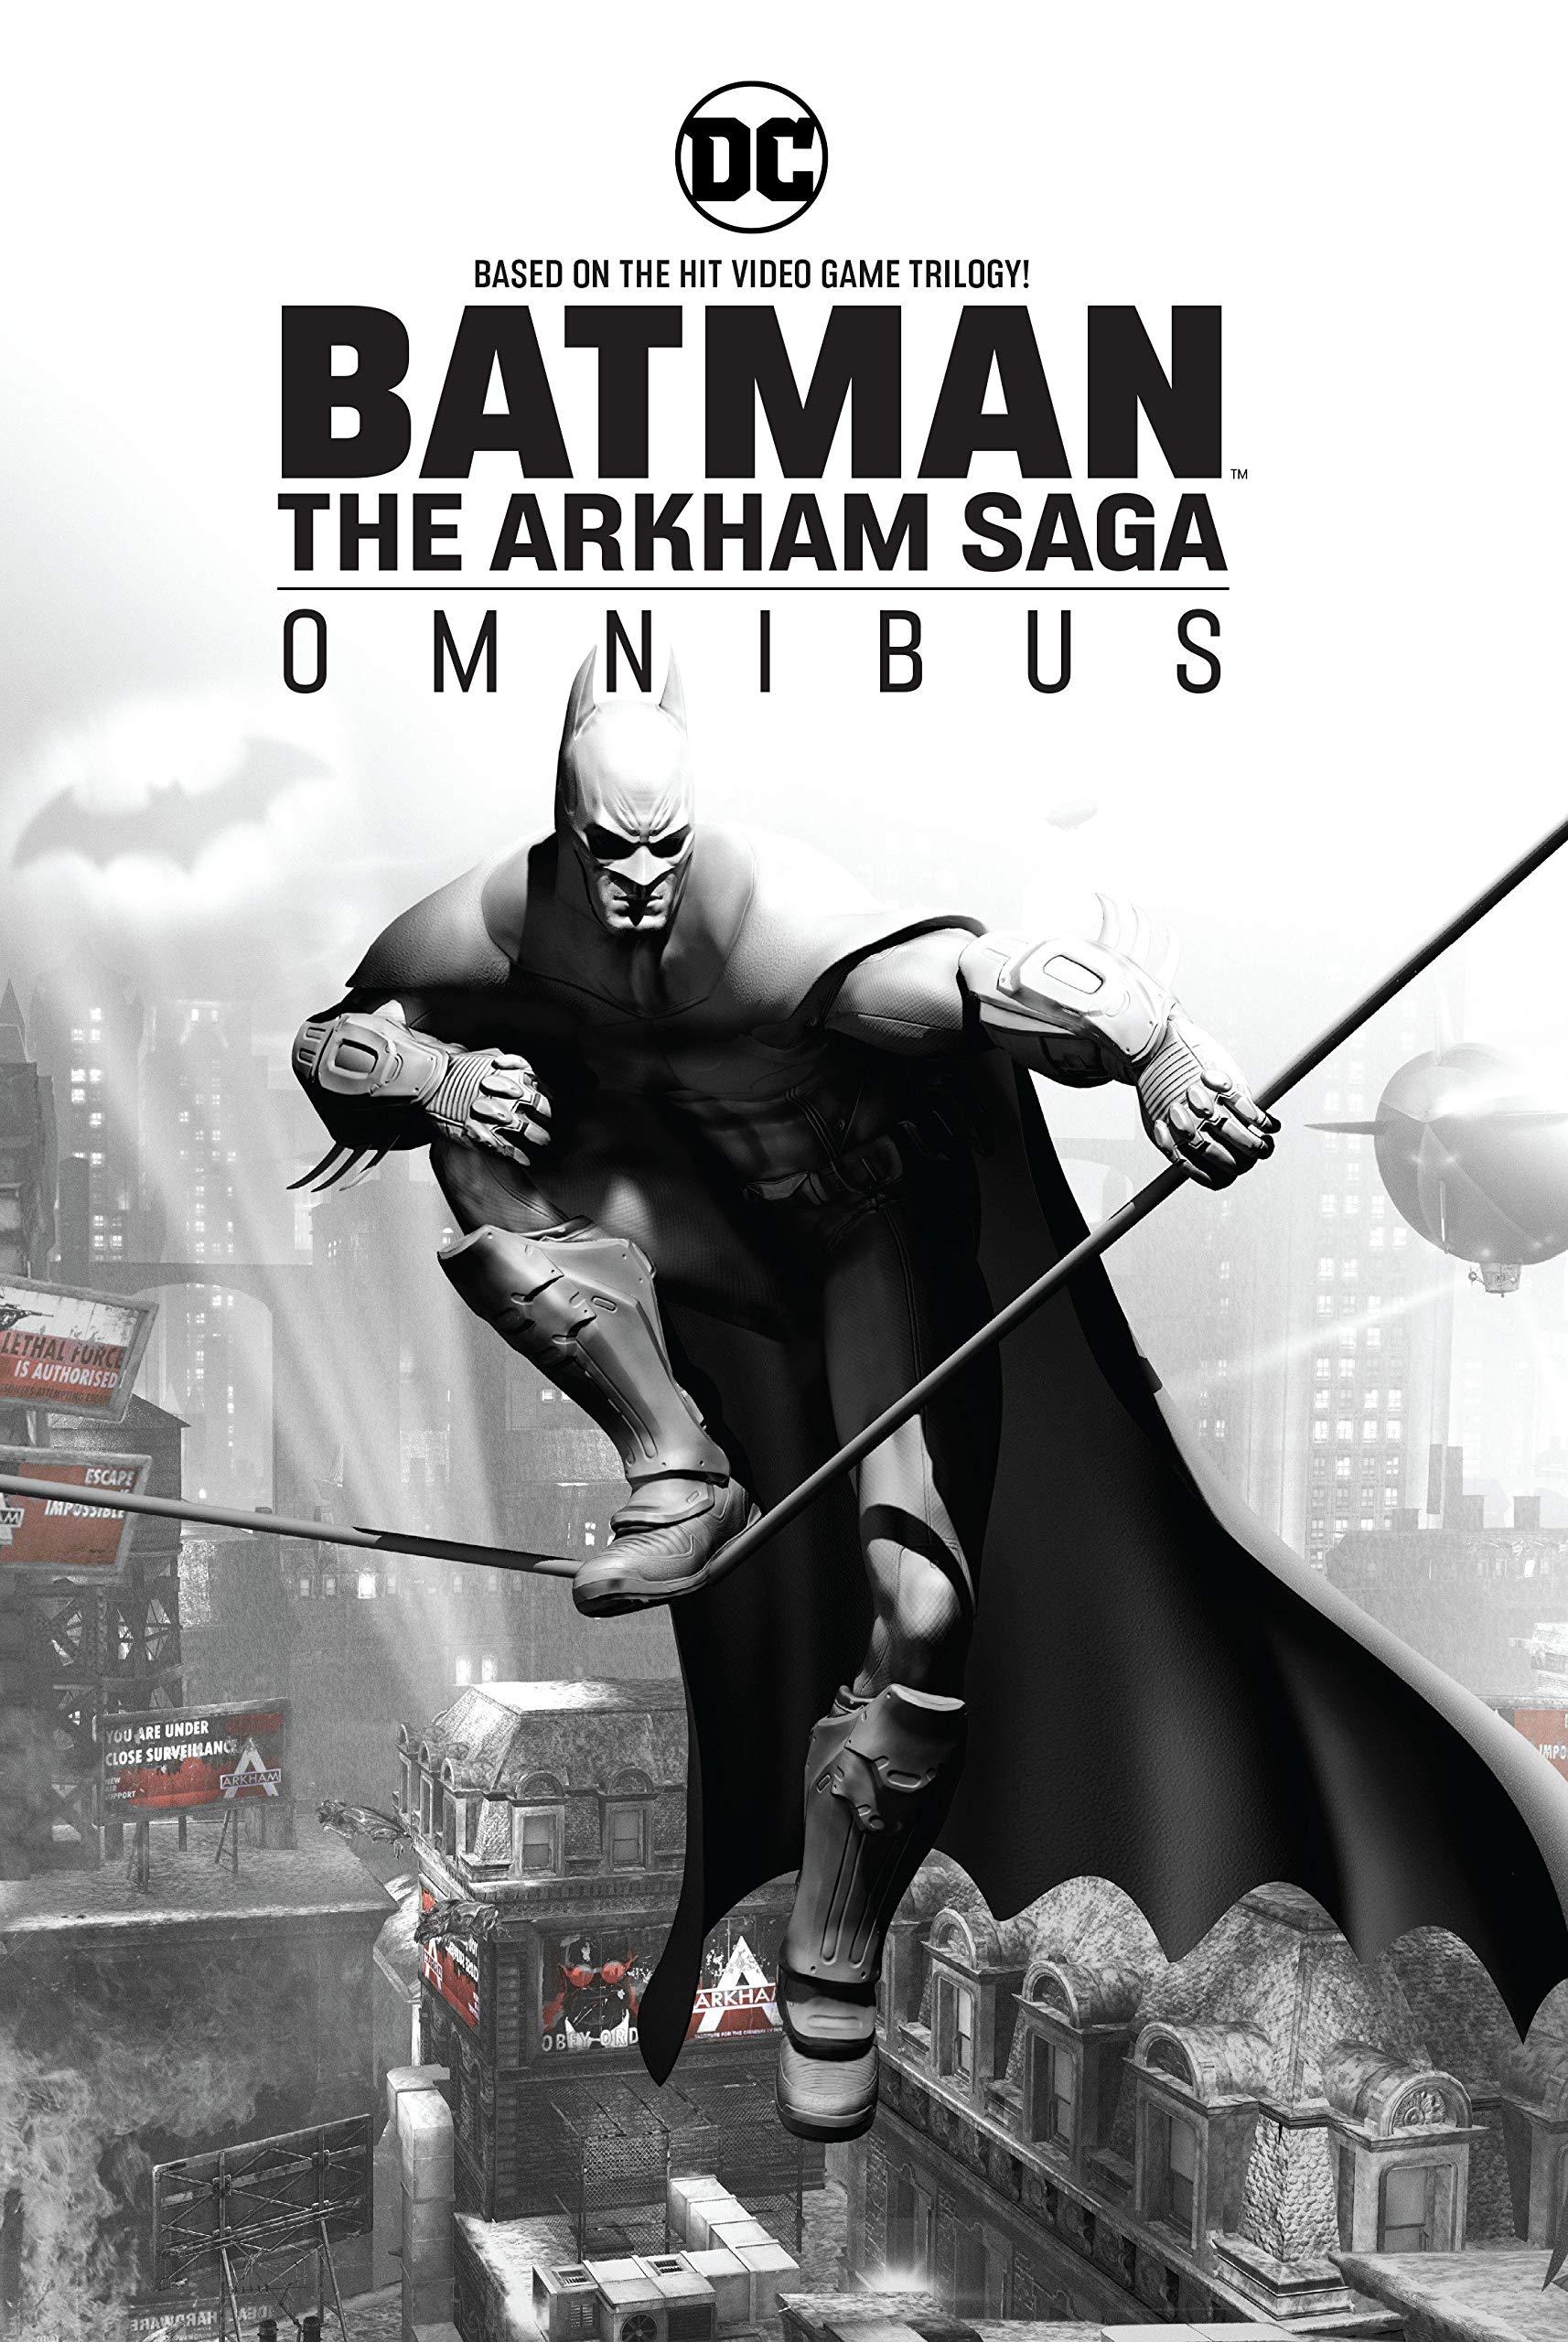 Batman The Arkham Saga Omnibus Paul Dini Peter J Tomasi Derek Fridolfs 9781401284329 Amazon Books